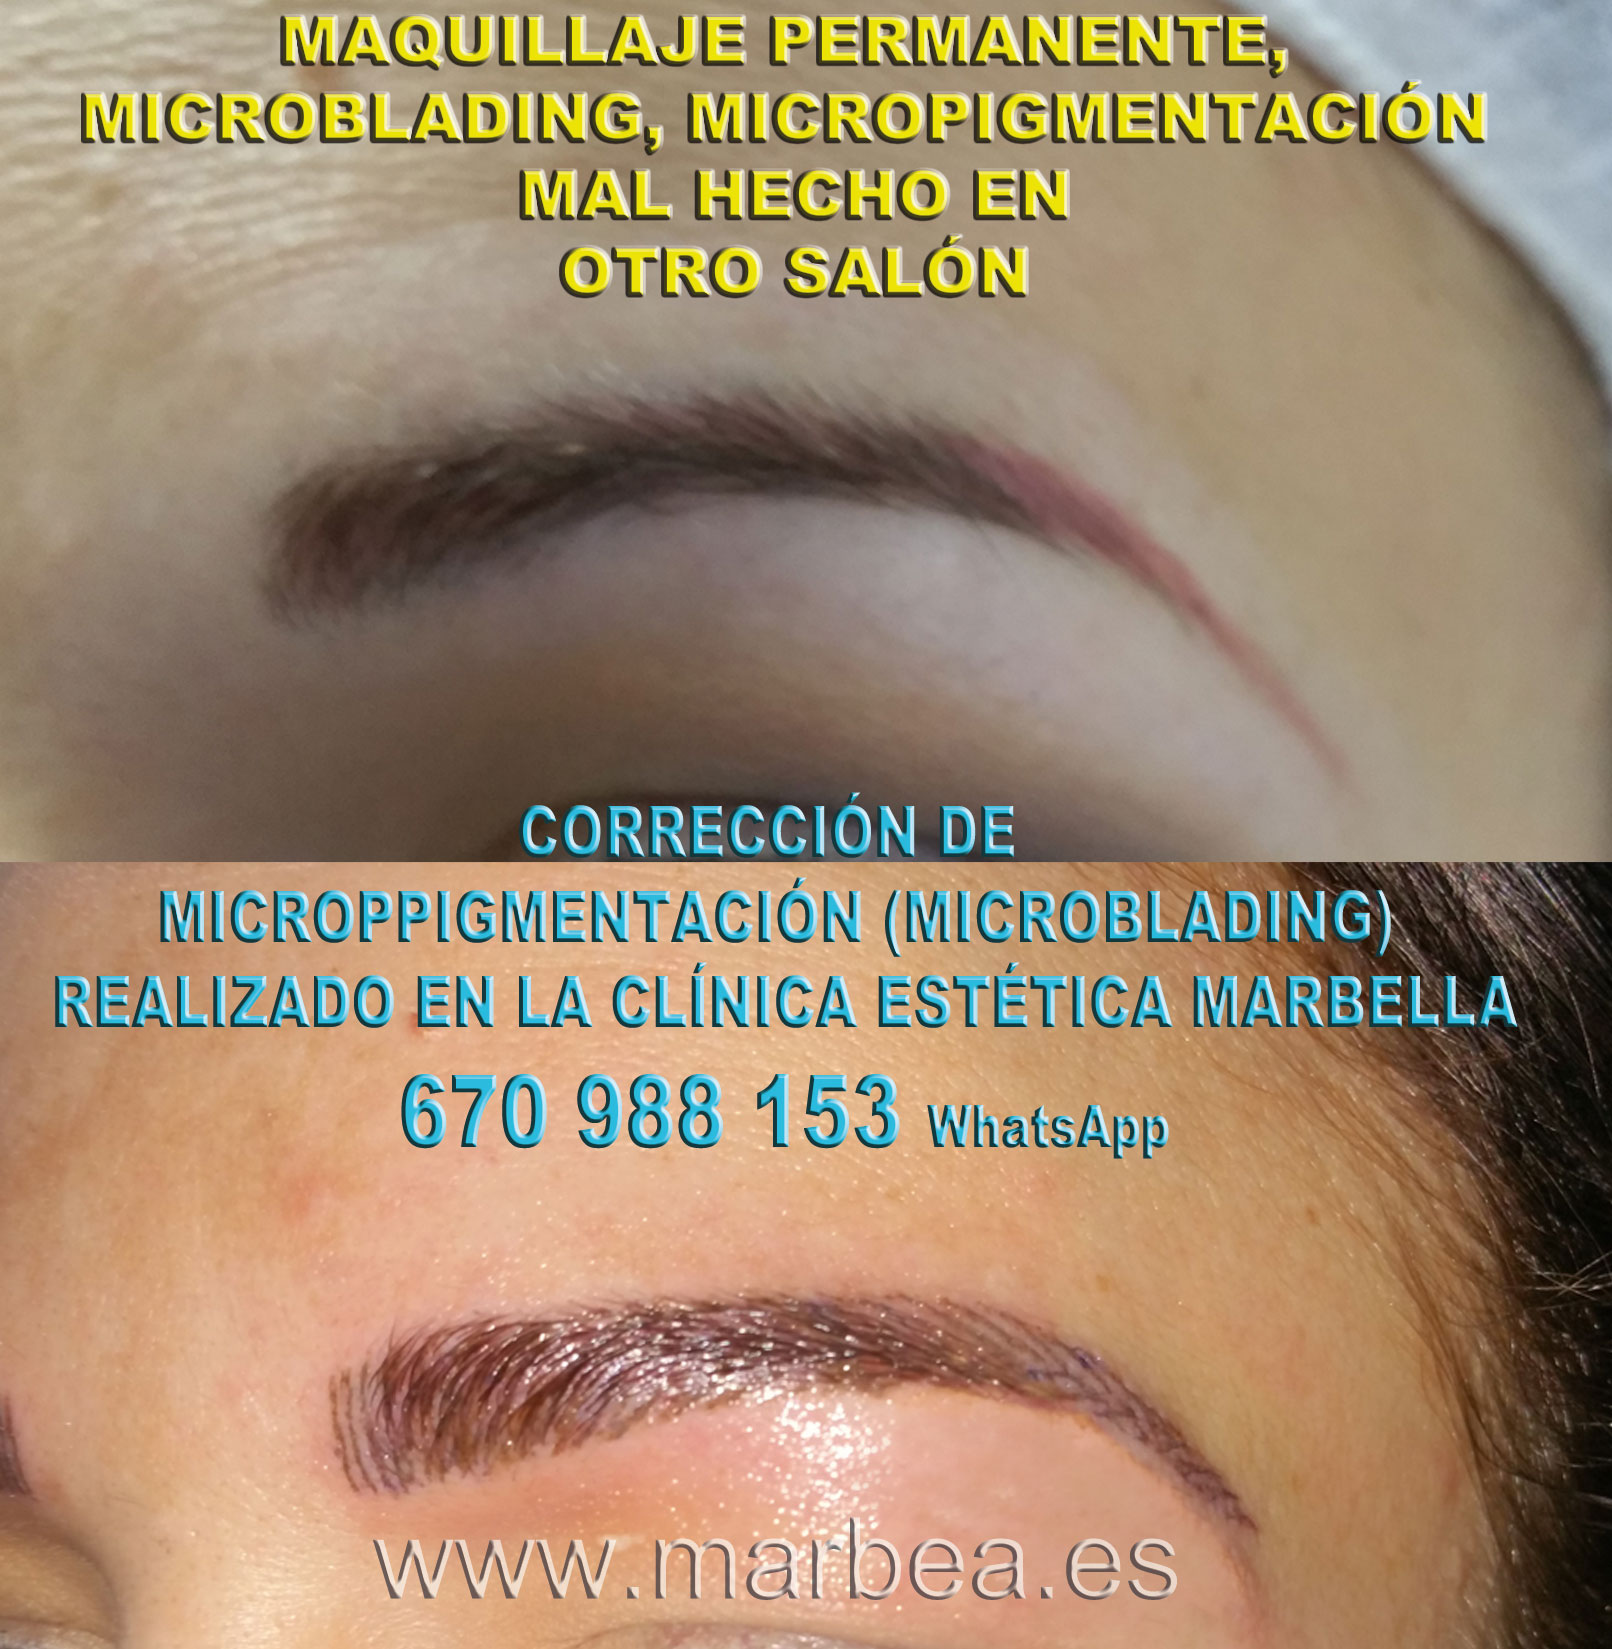 QUITAR TATUAJE CEJAS clínica estética maquillaje permanete ofrece corrección de cejas mal tatuadas,corregir micropigmentación no deseada